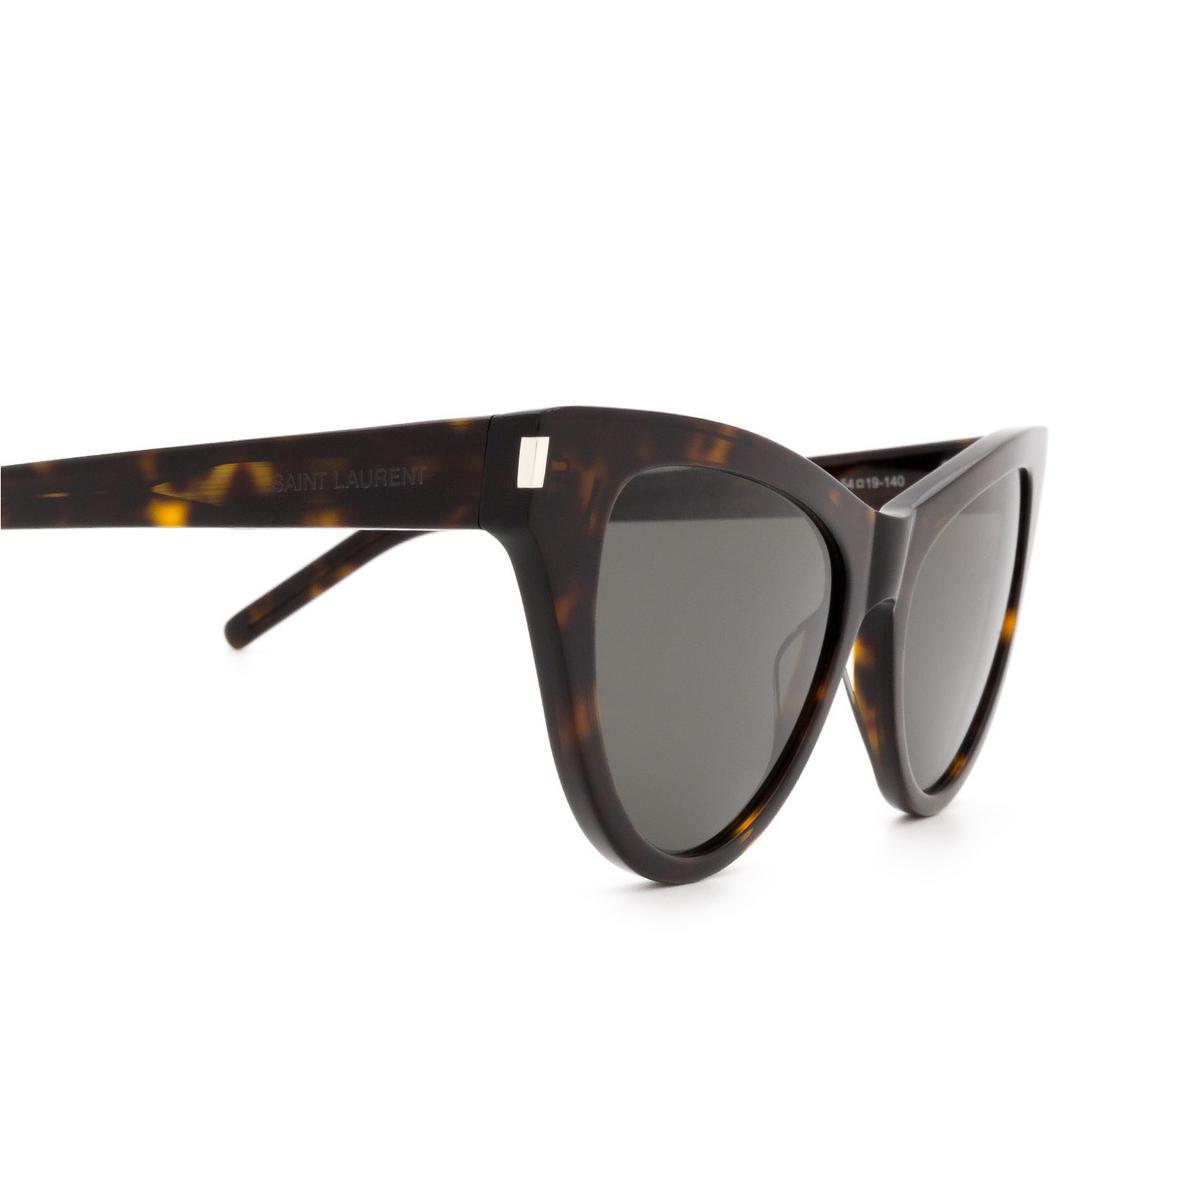 Saint Laurent® Cat-eye Sunglasses: SL 425 color Havana 002 - 3/3.